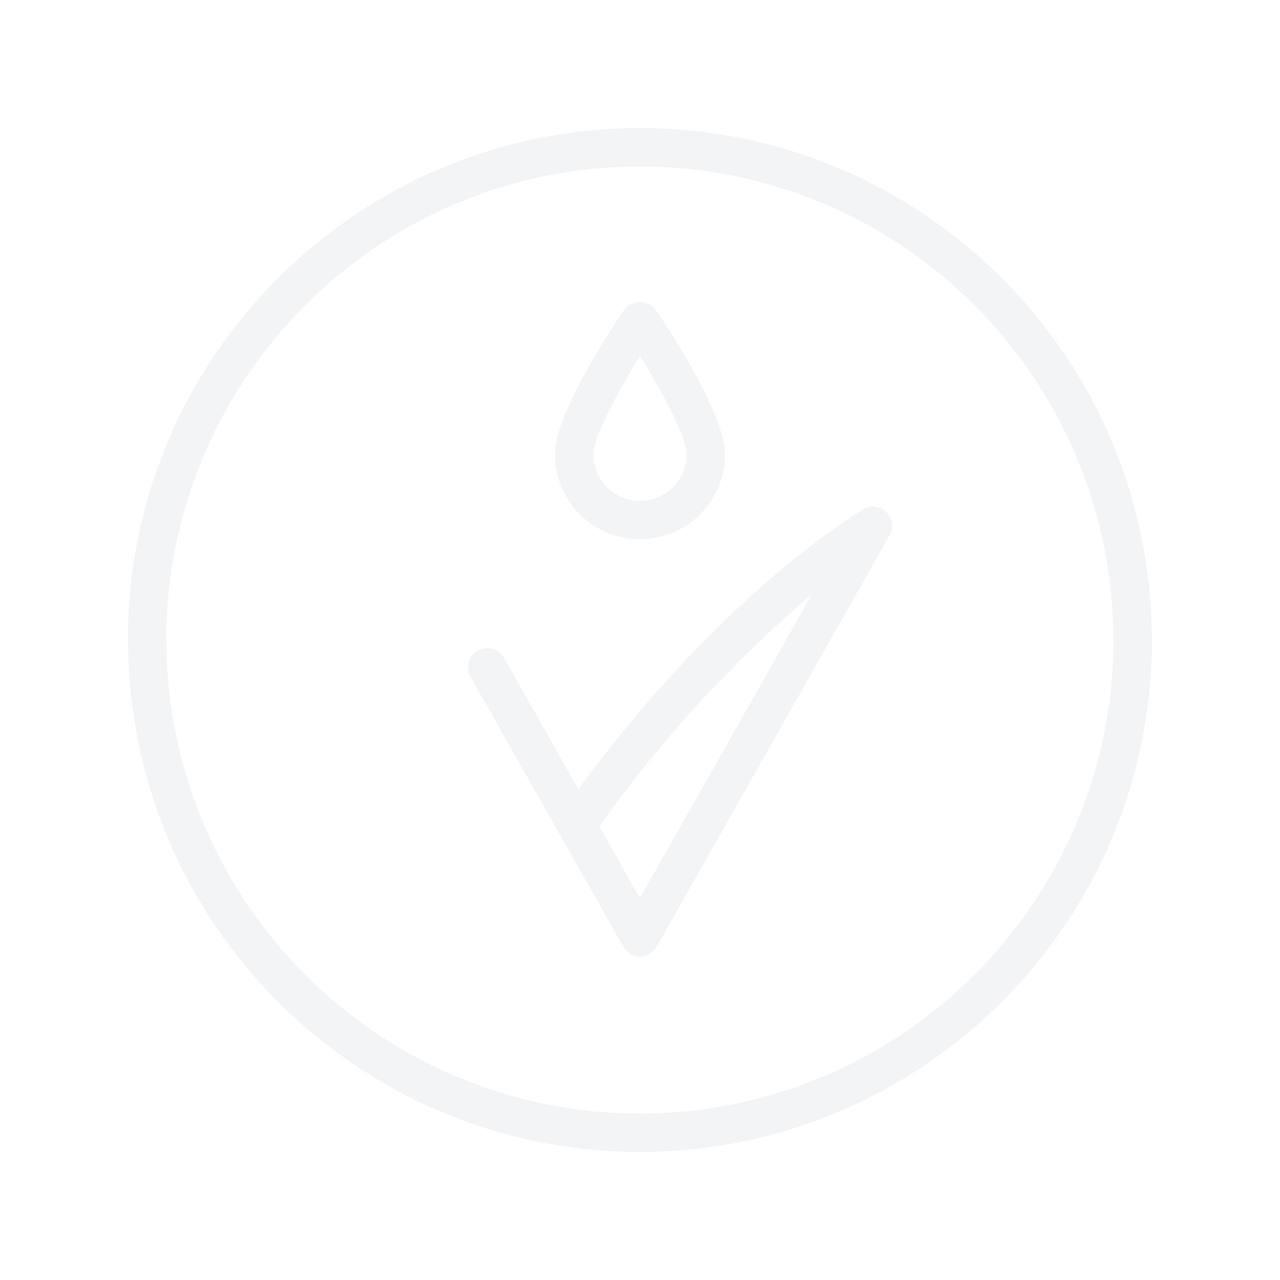 Wella Professionals EIMI Dry Me Dry Shampoo